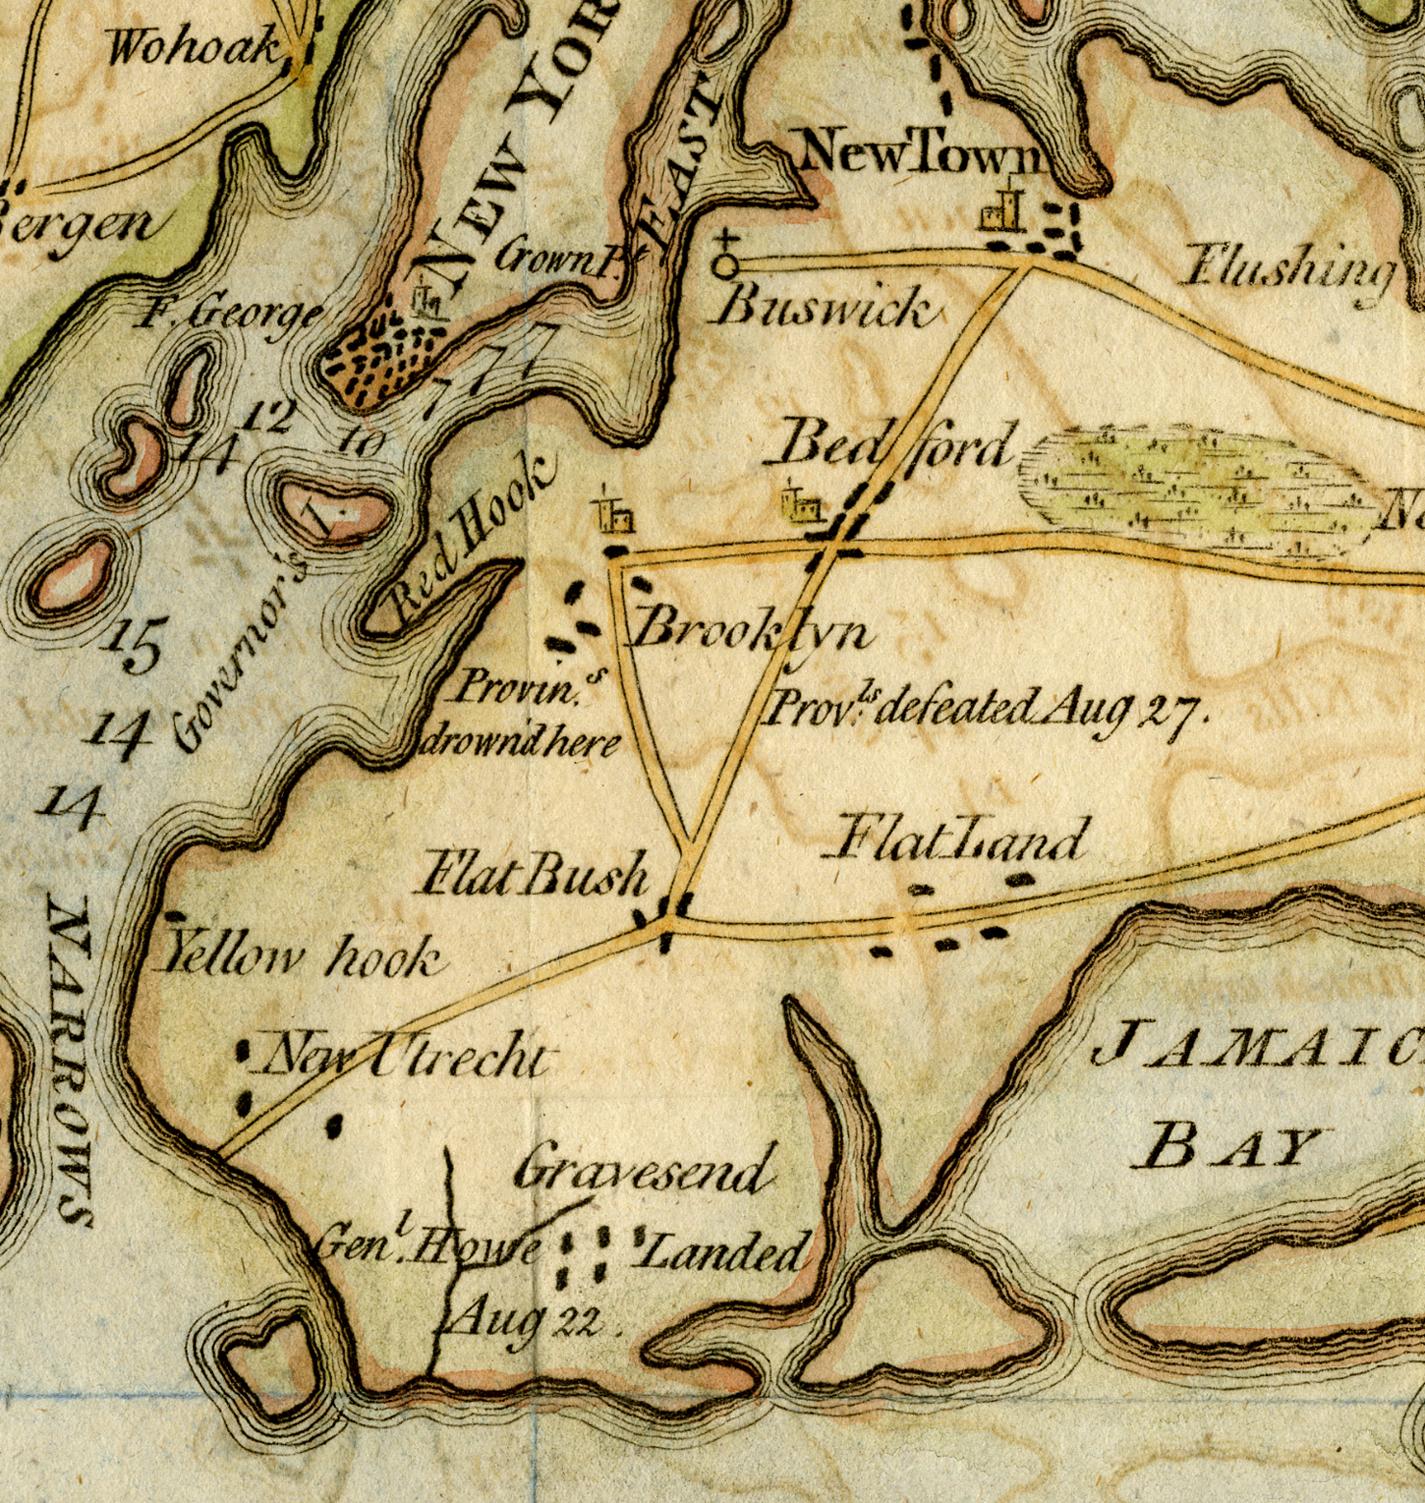 1- bhs_map_rev_war_1776_fl.ra_newyork.jpg